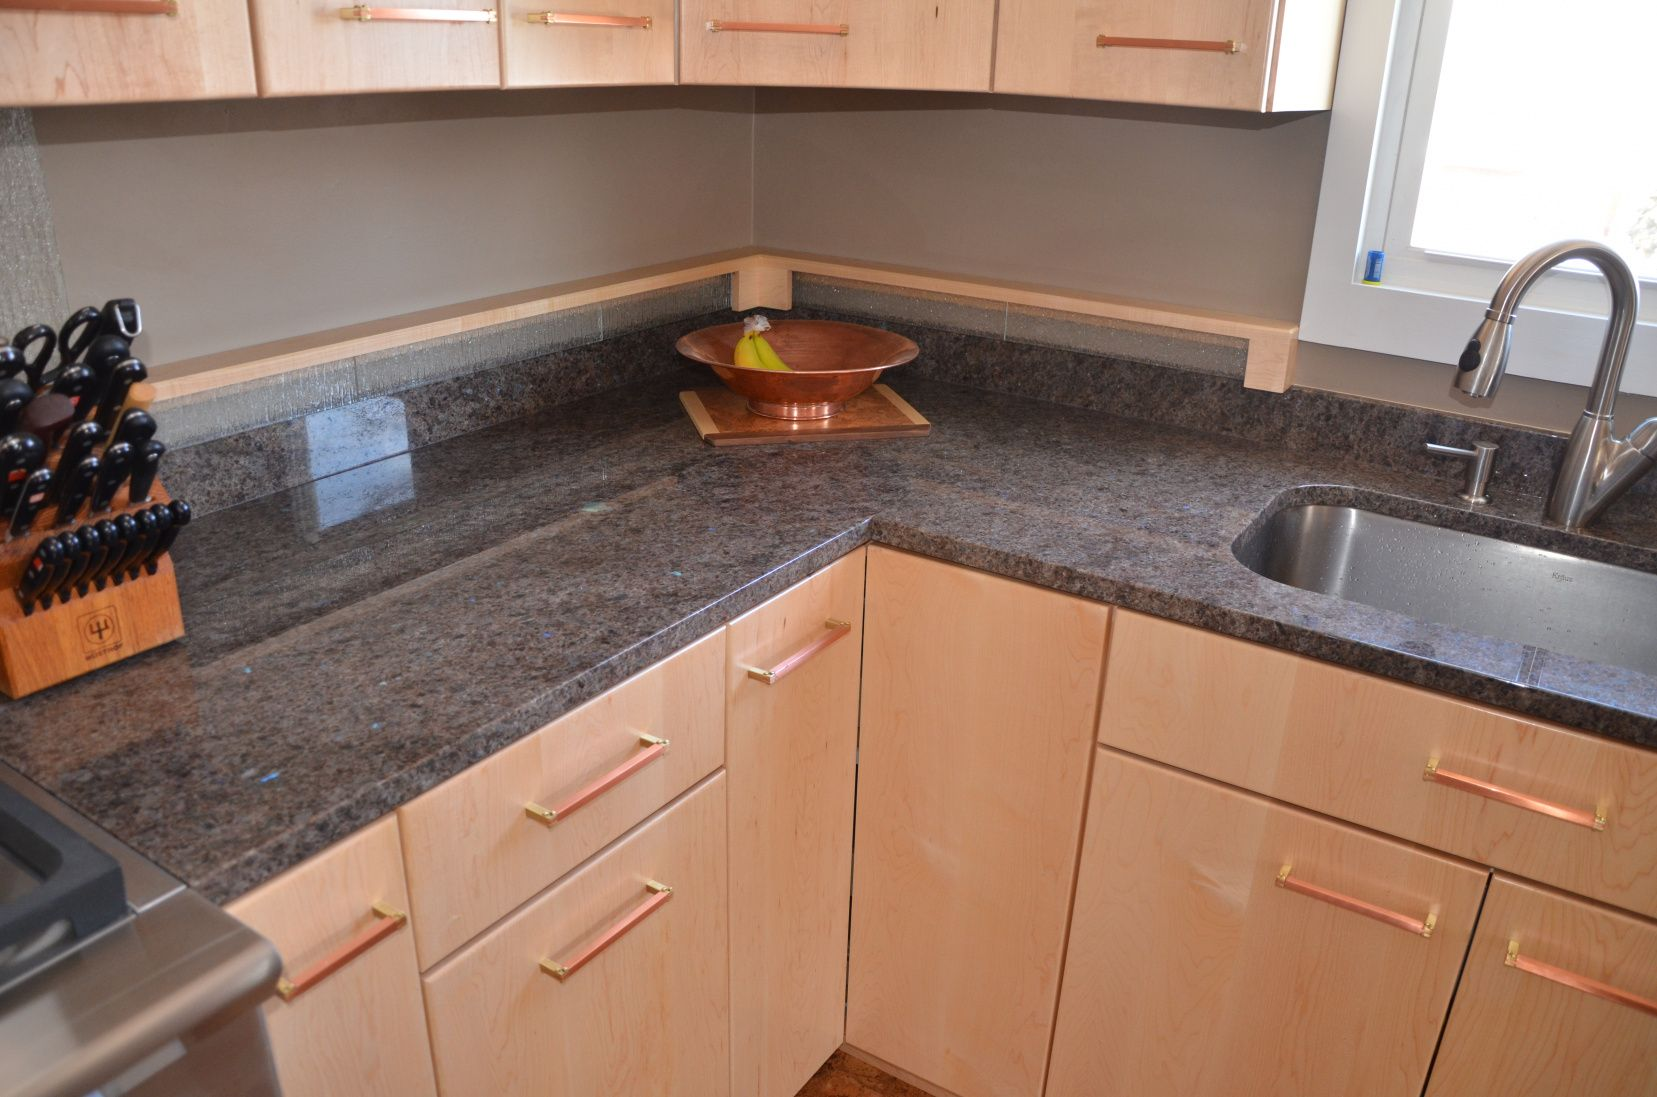 55 Labrador Green Granite Countertop Kitchen Floor Vinyl Ideas